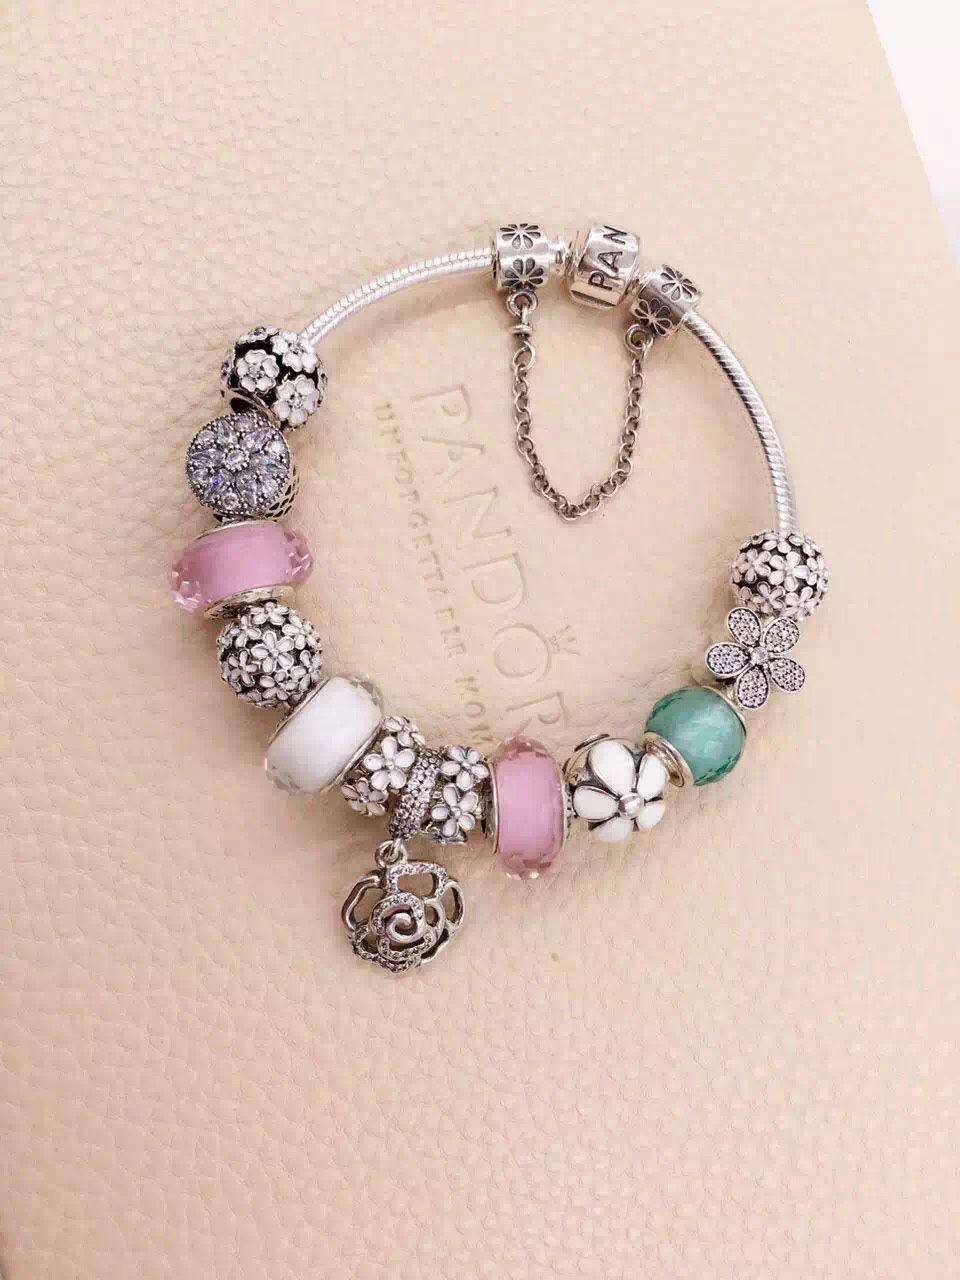 90d23c37a427 50% OFF!!! $339 Pandora Charm Bracelet White Pink Green. Hot Sale ...